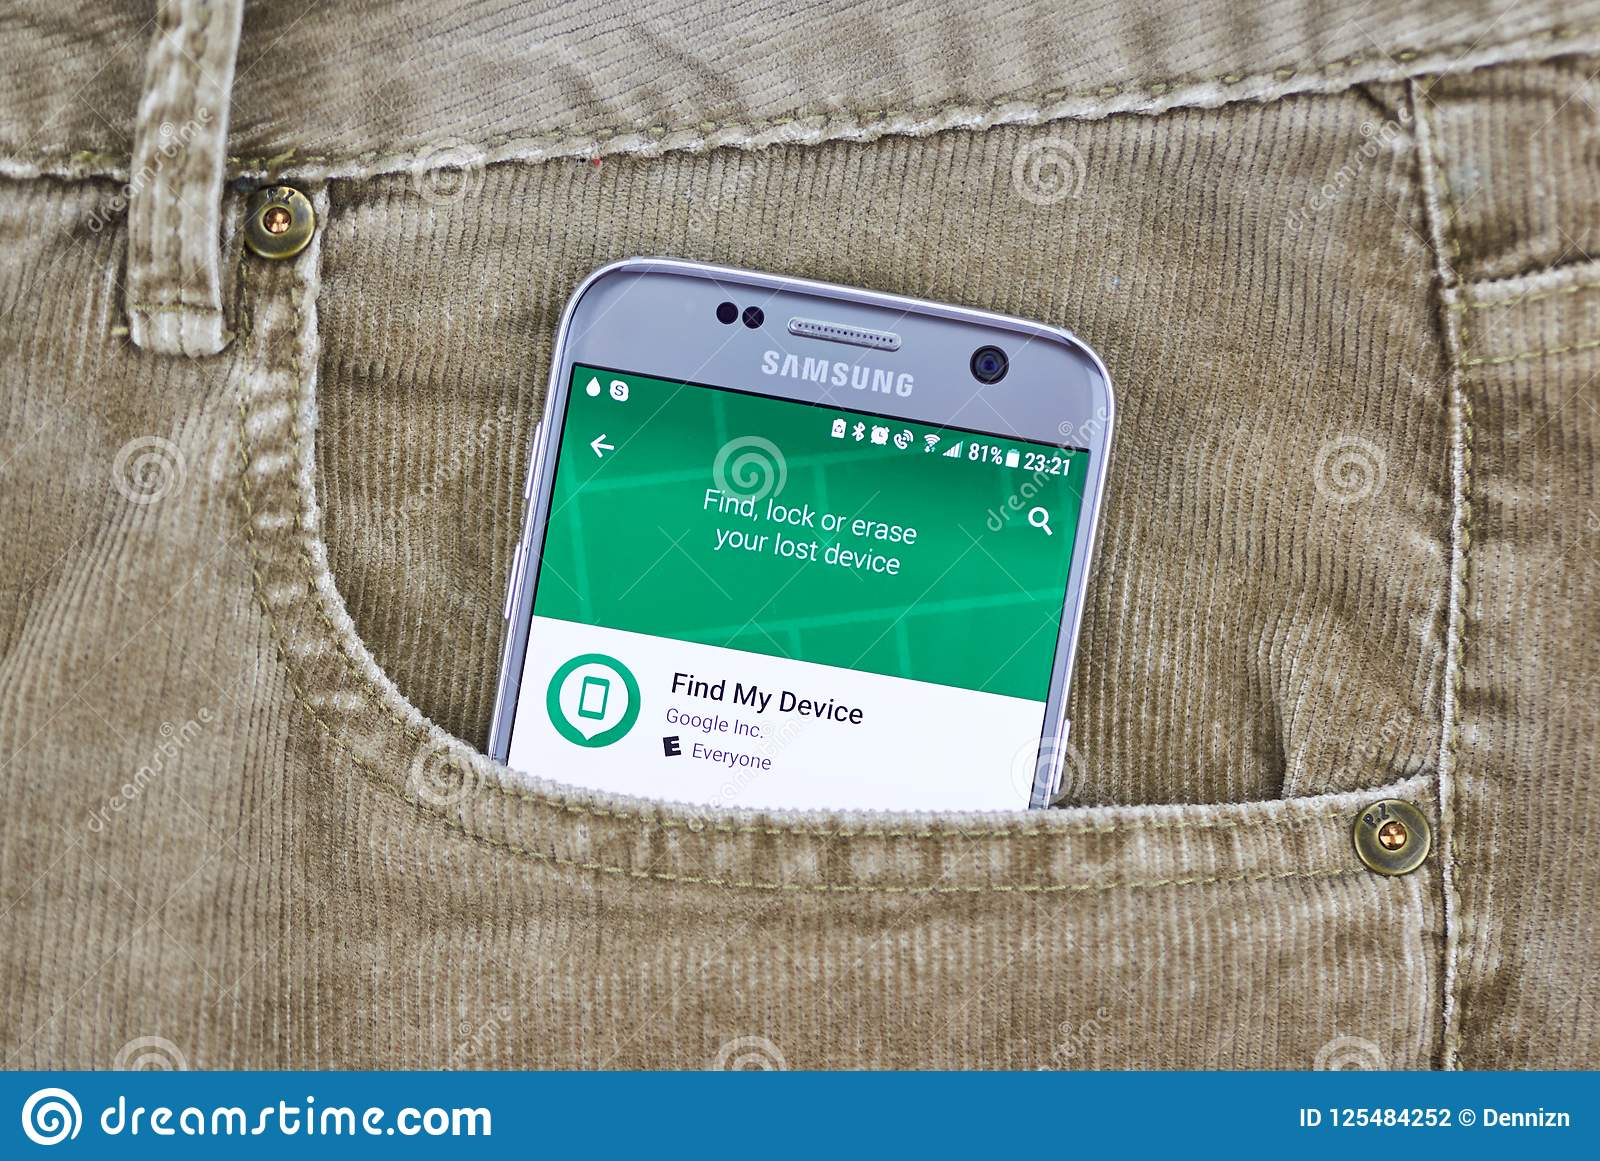 find my device google